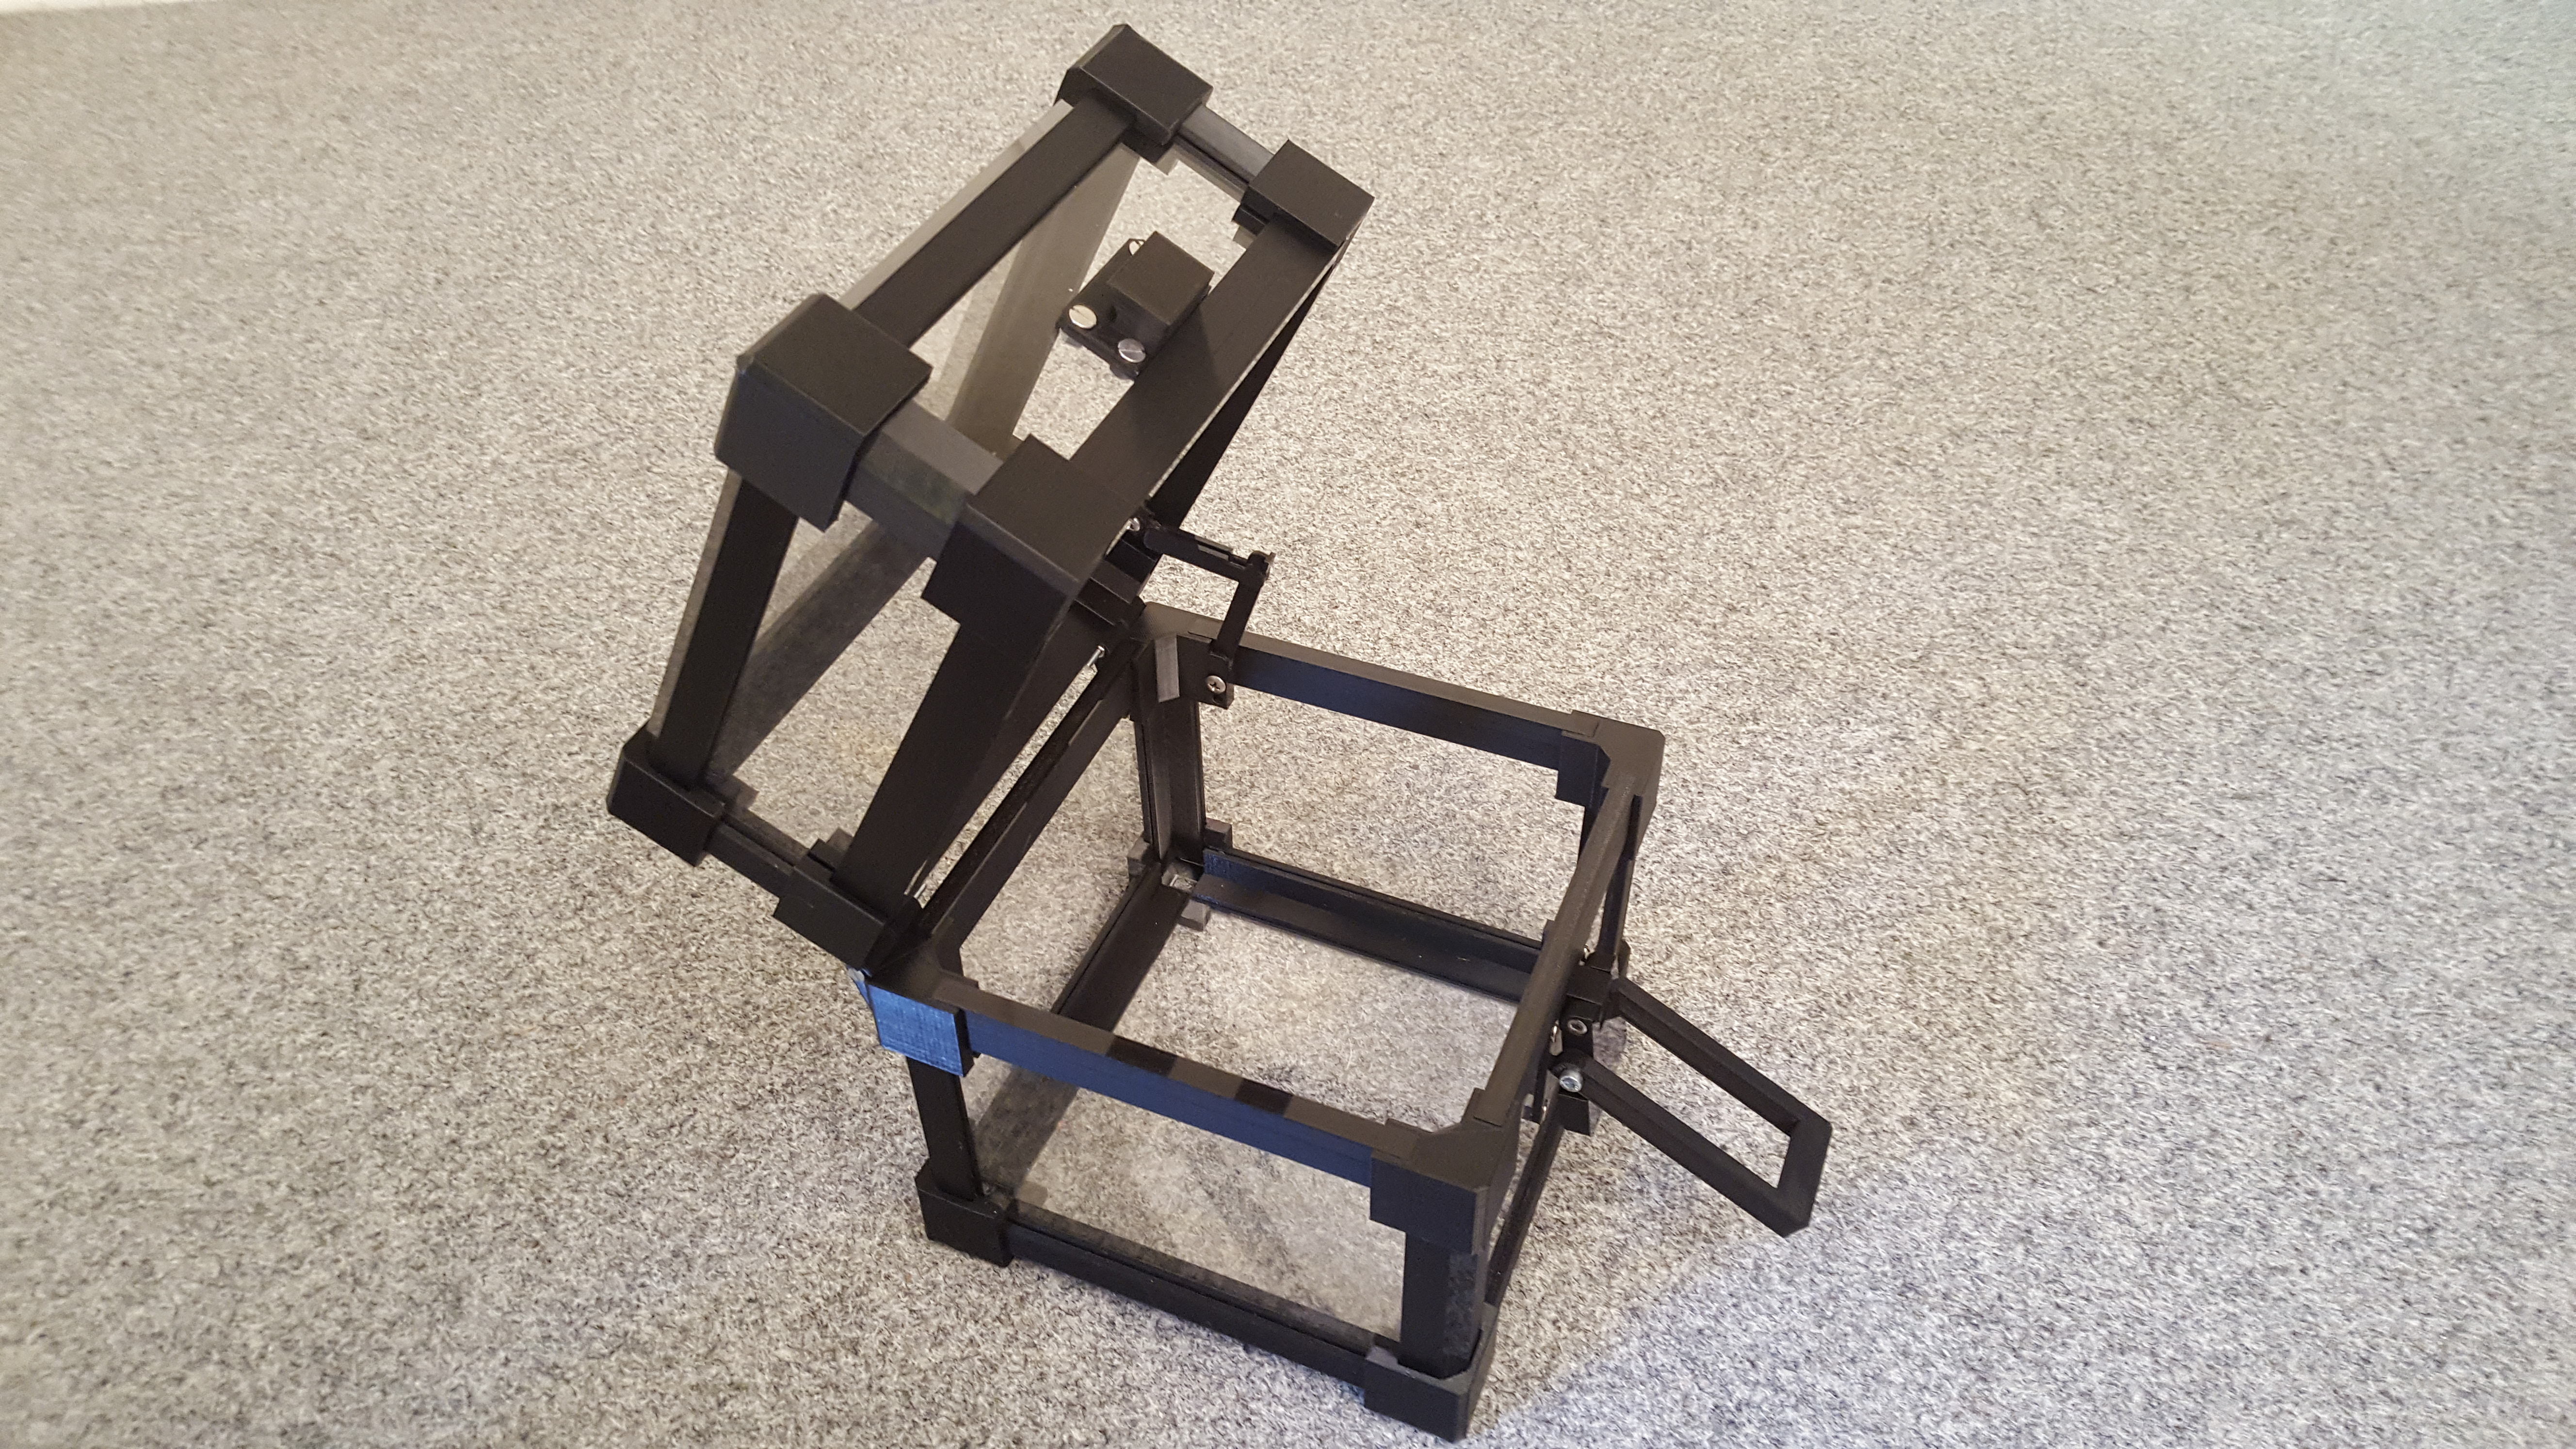 20190818_164758.jpg Download STL file LazyMans Box • Model to 3D print, Job